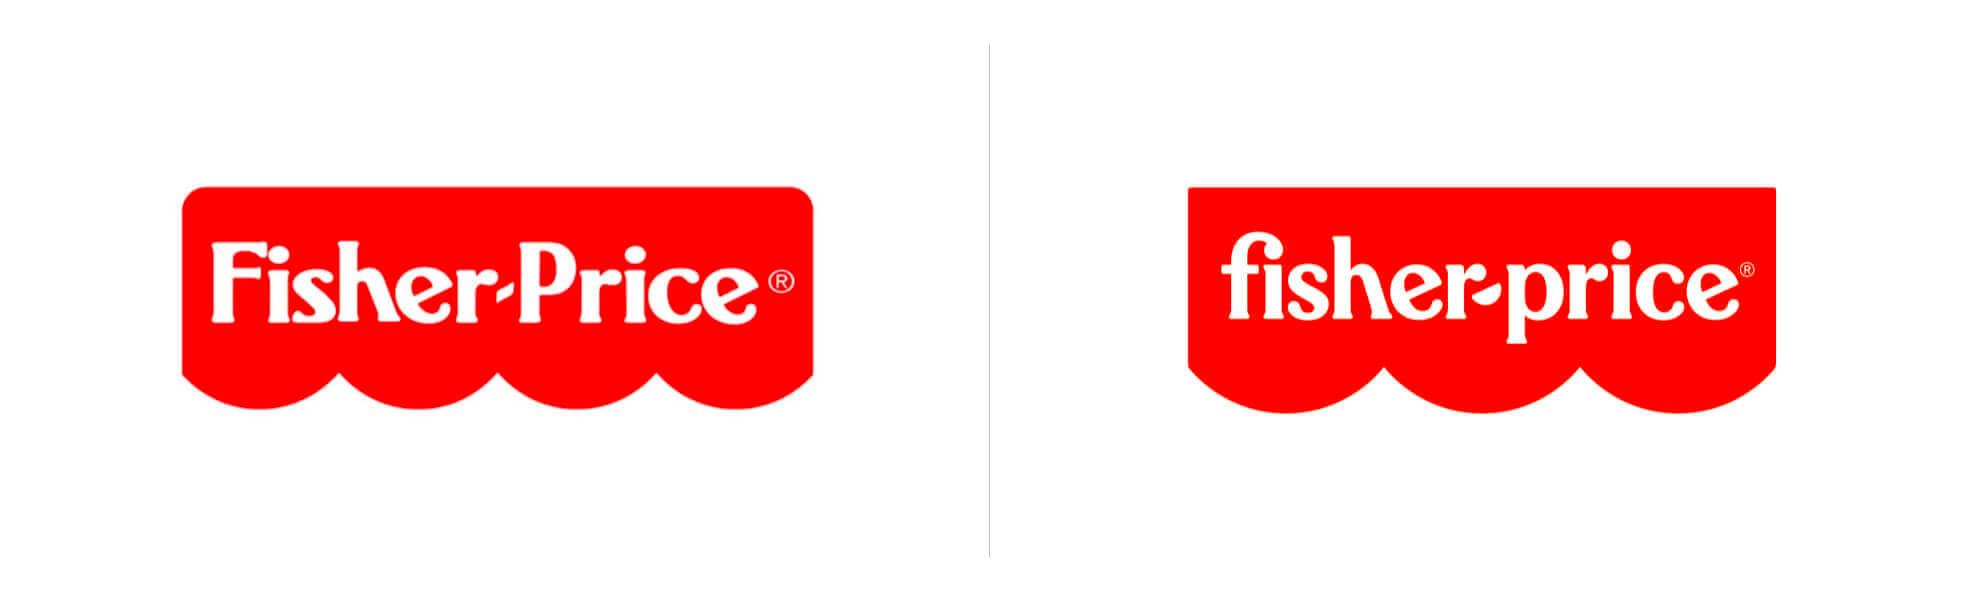 nowe logo Fisher-Price